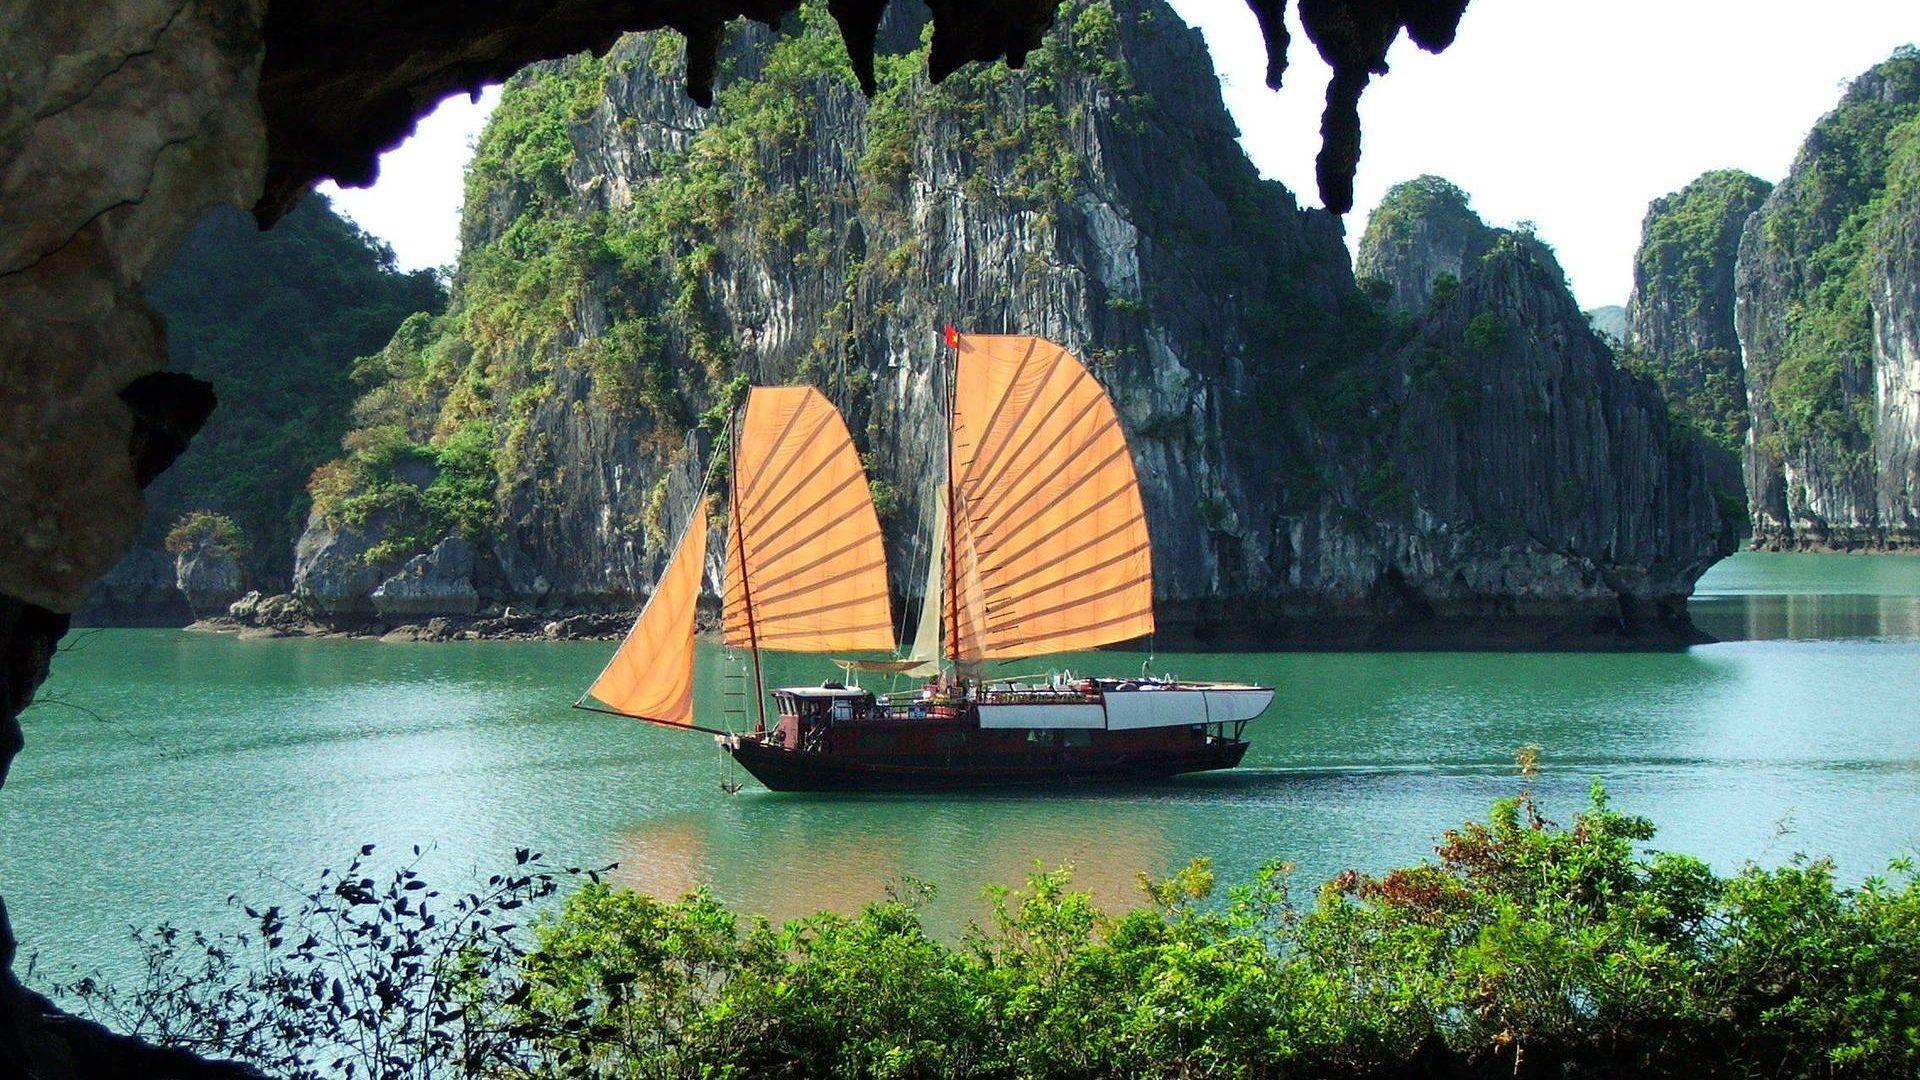 China Seas Sigourney